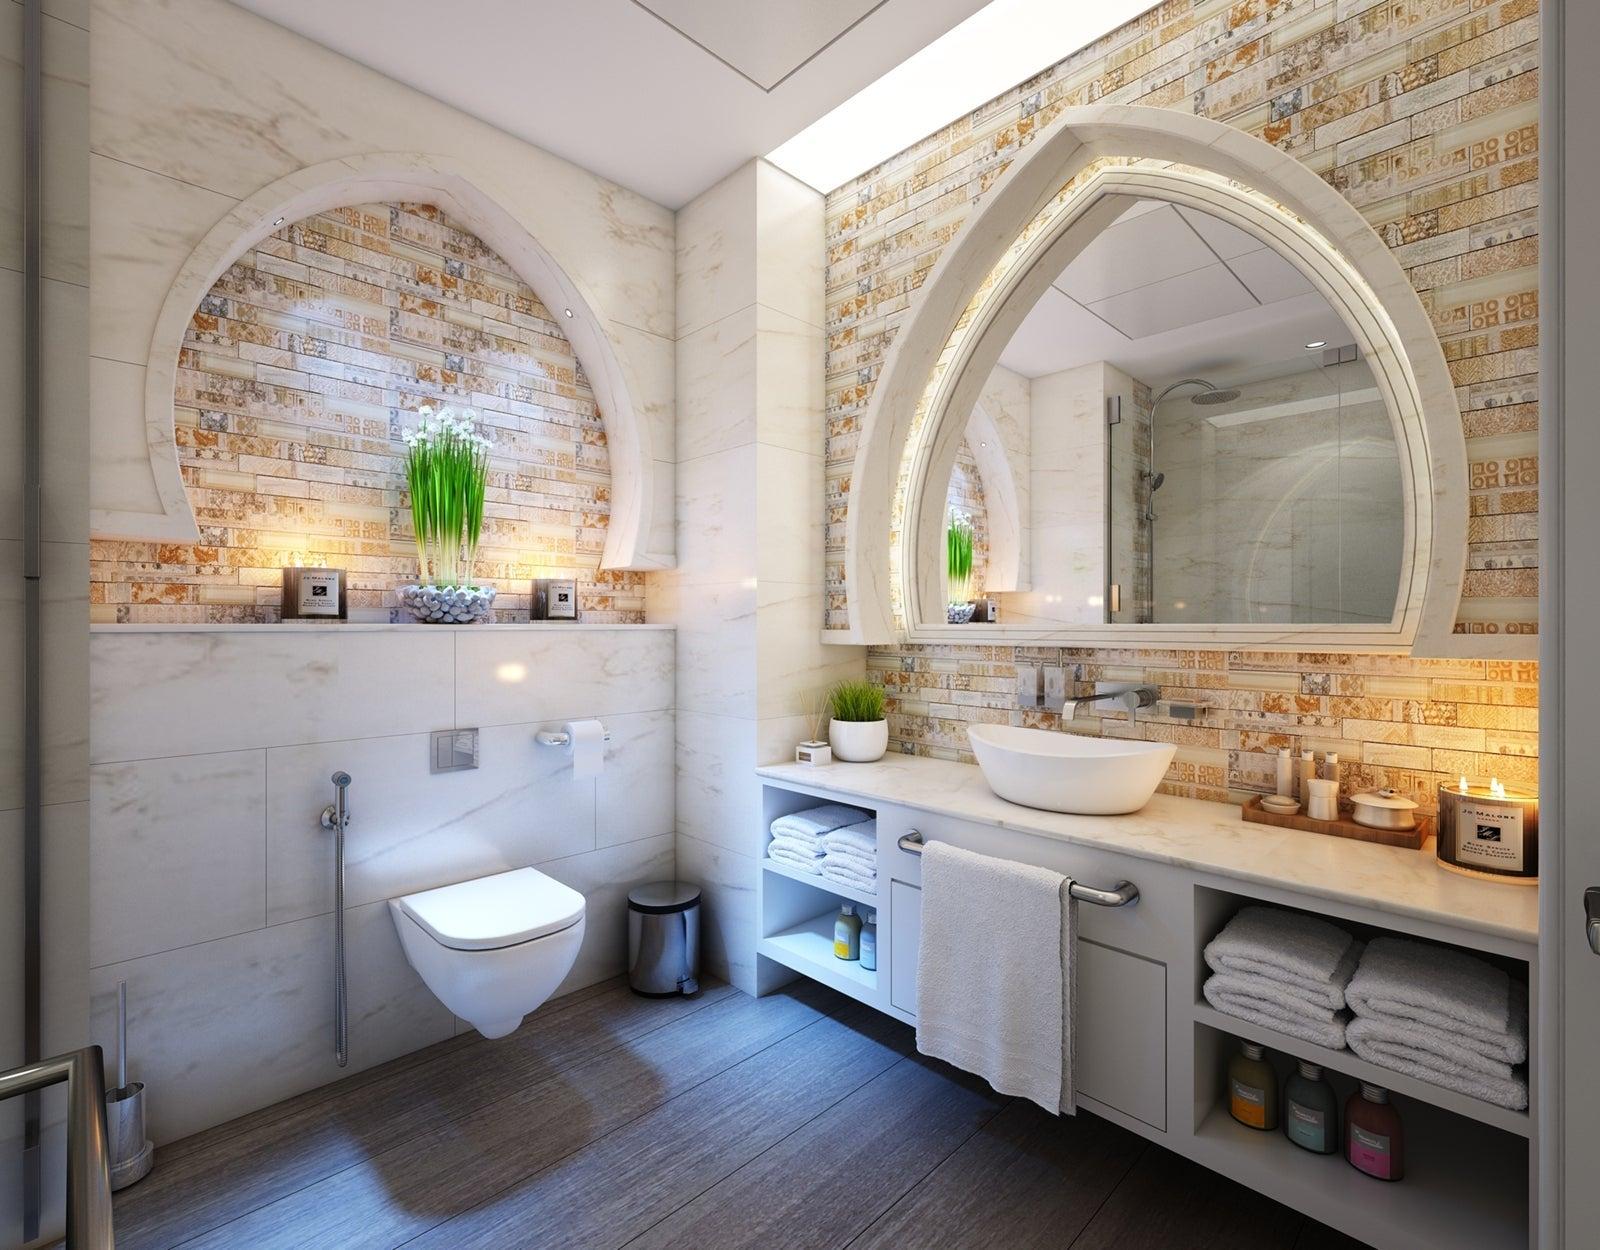 Royal Bathroom in House